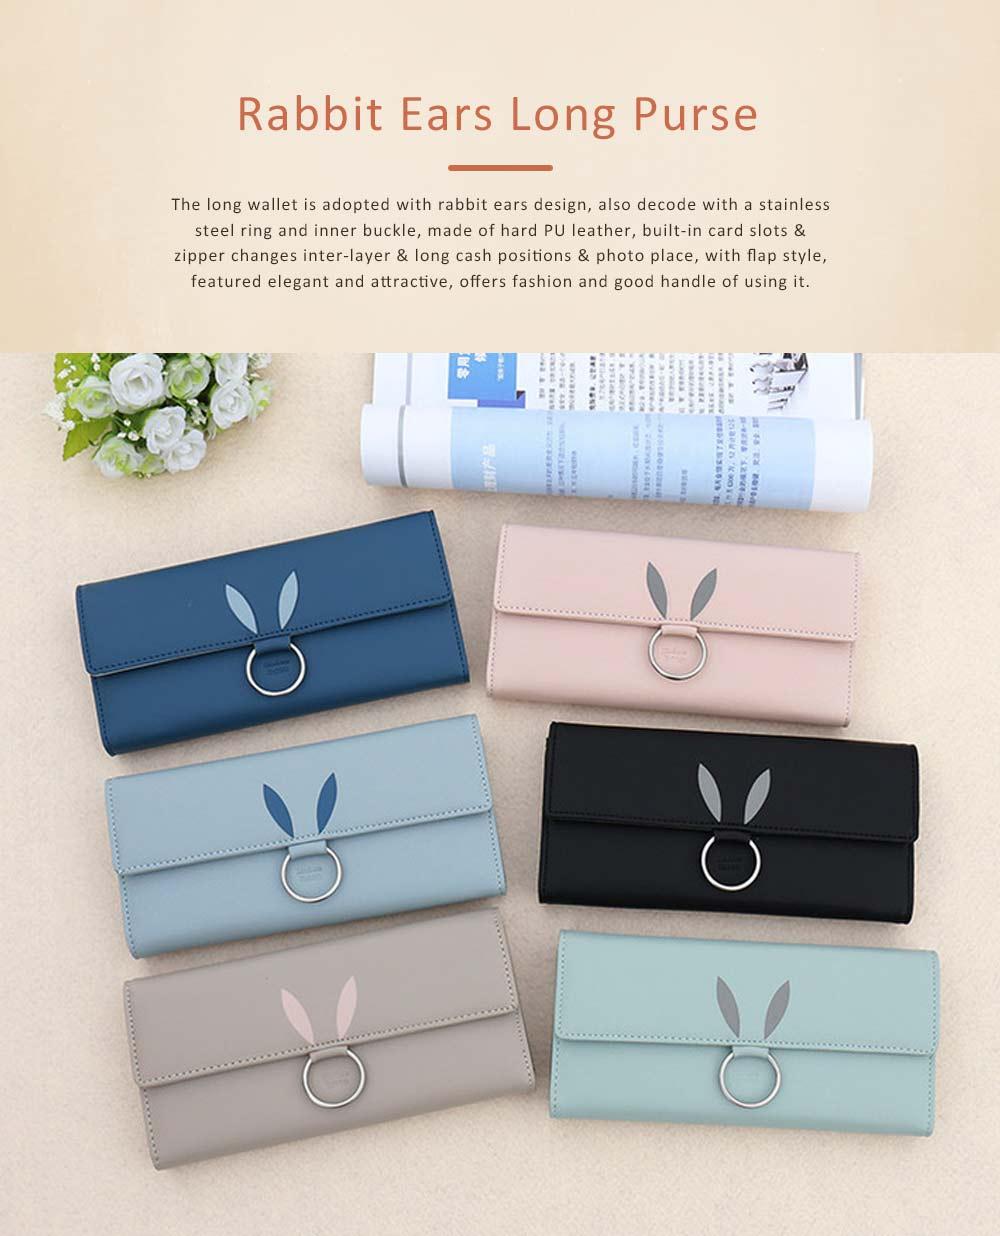 Rabbit Ears Ring Long Purse for Women, Hard PU Leather Macaron Color Buckle Card Holder Long Clutch Elegant Flap Purse 0